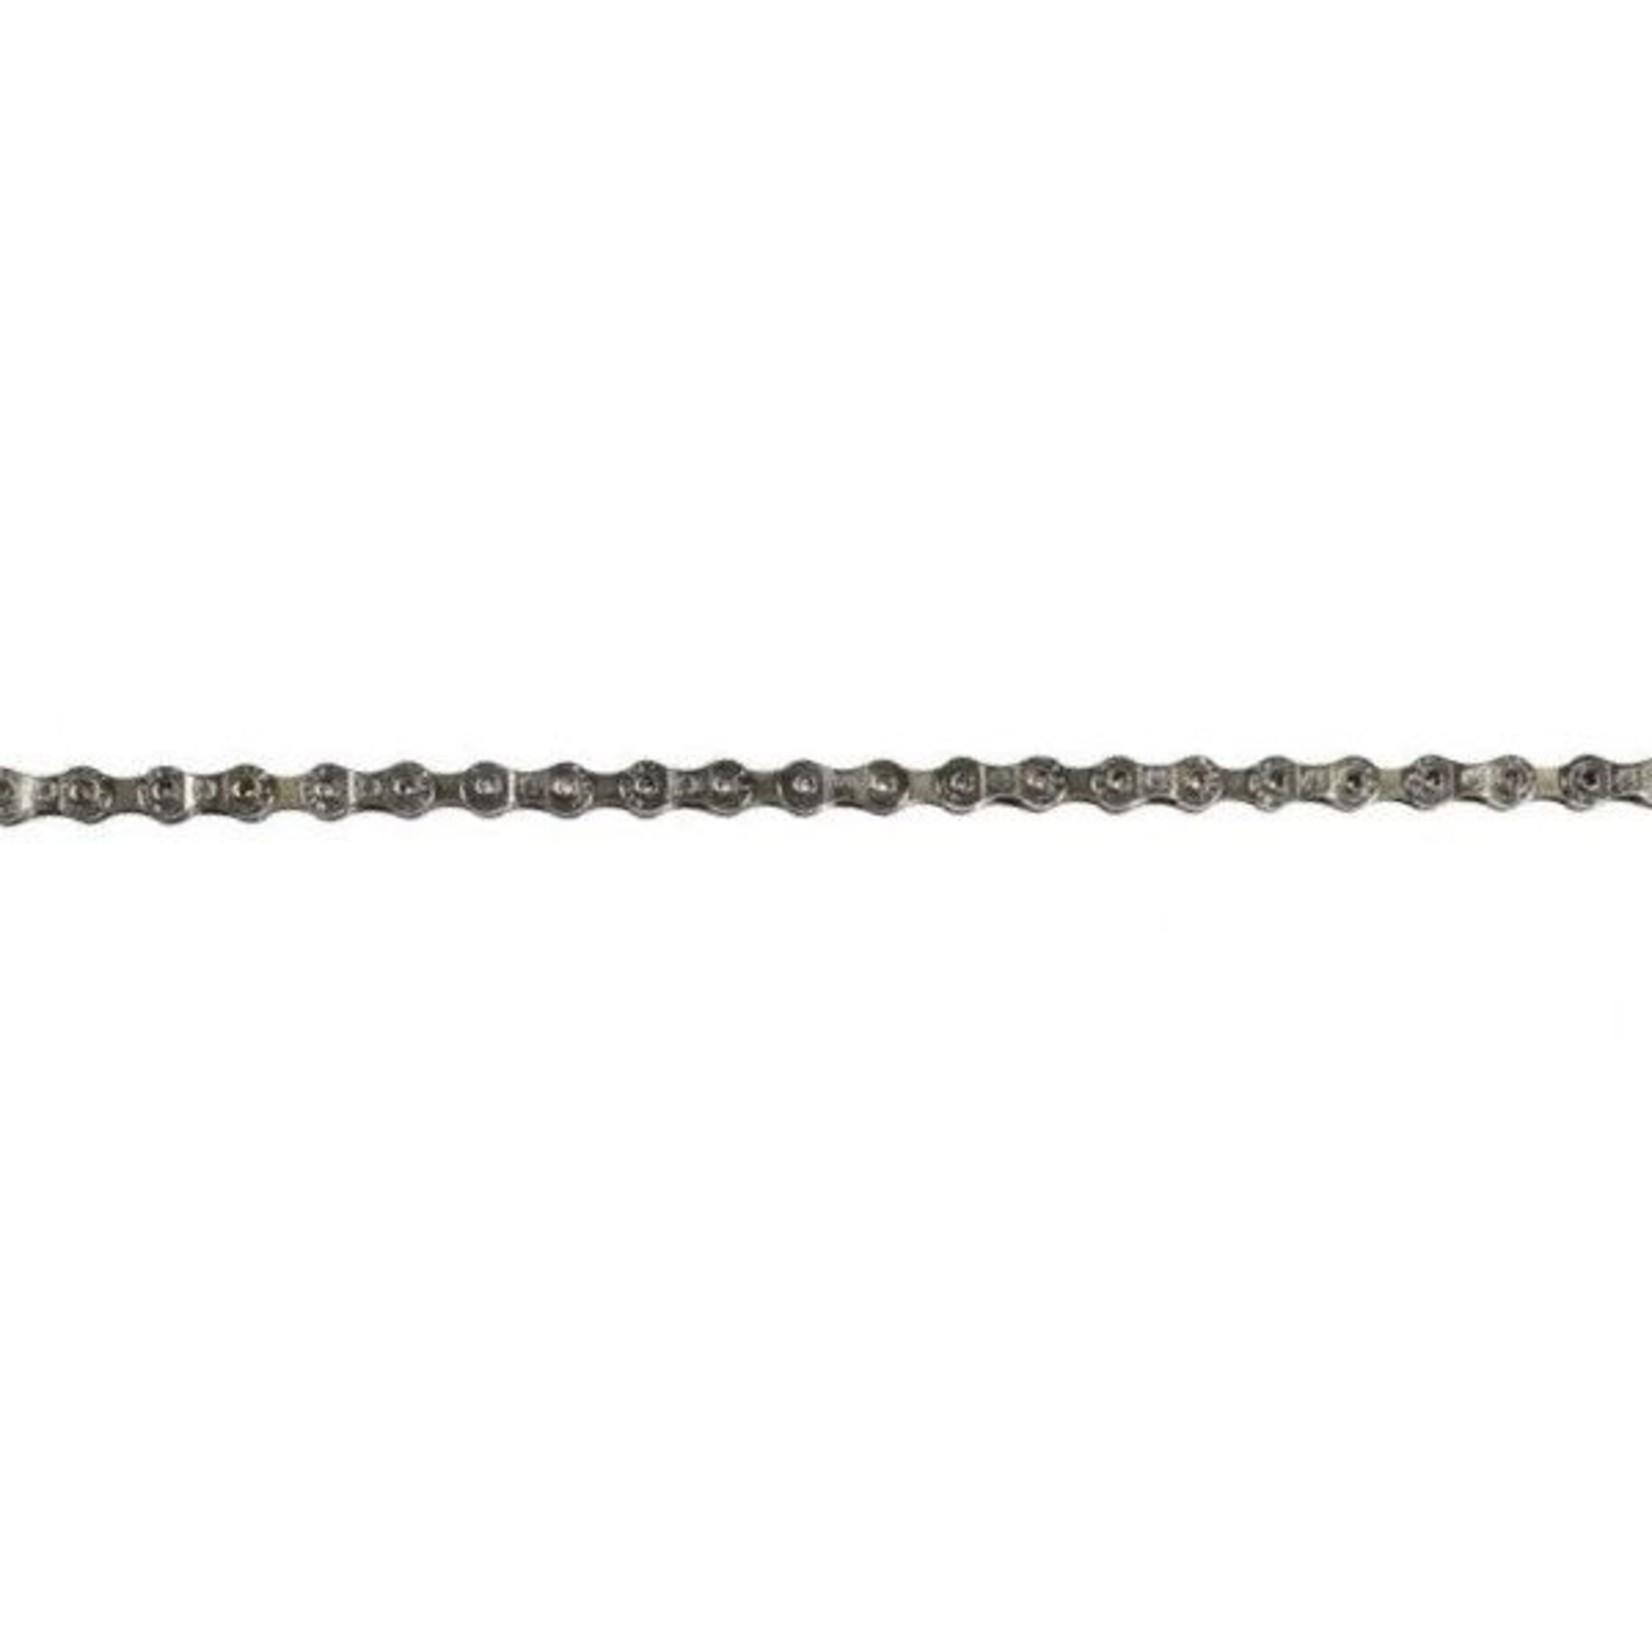 Sinz Sinz Race Hollow Pin Chain 3/32 Silver